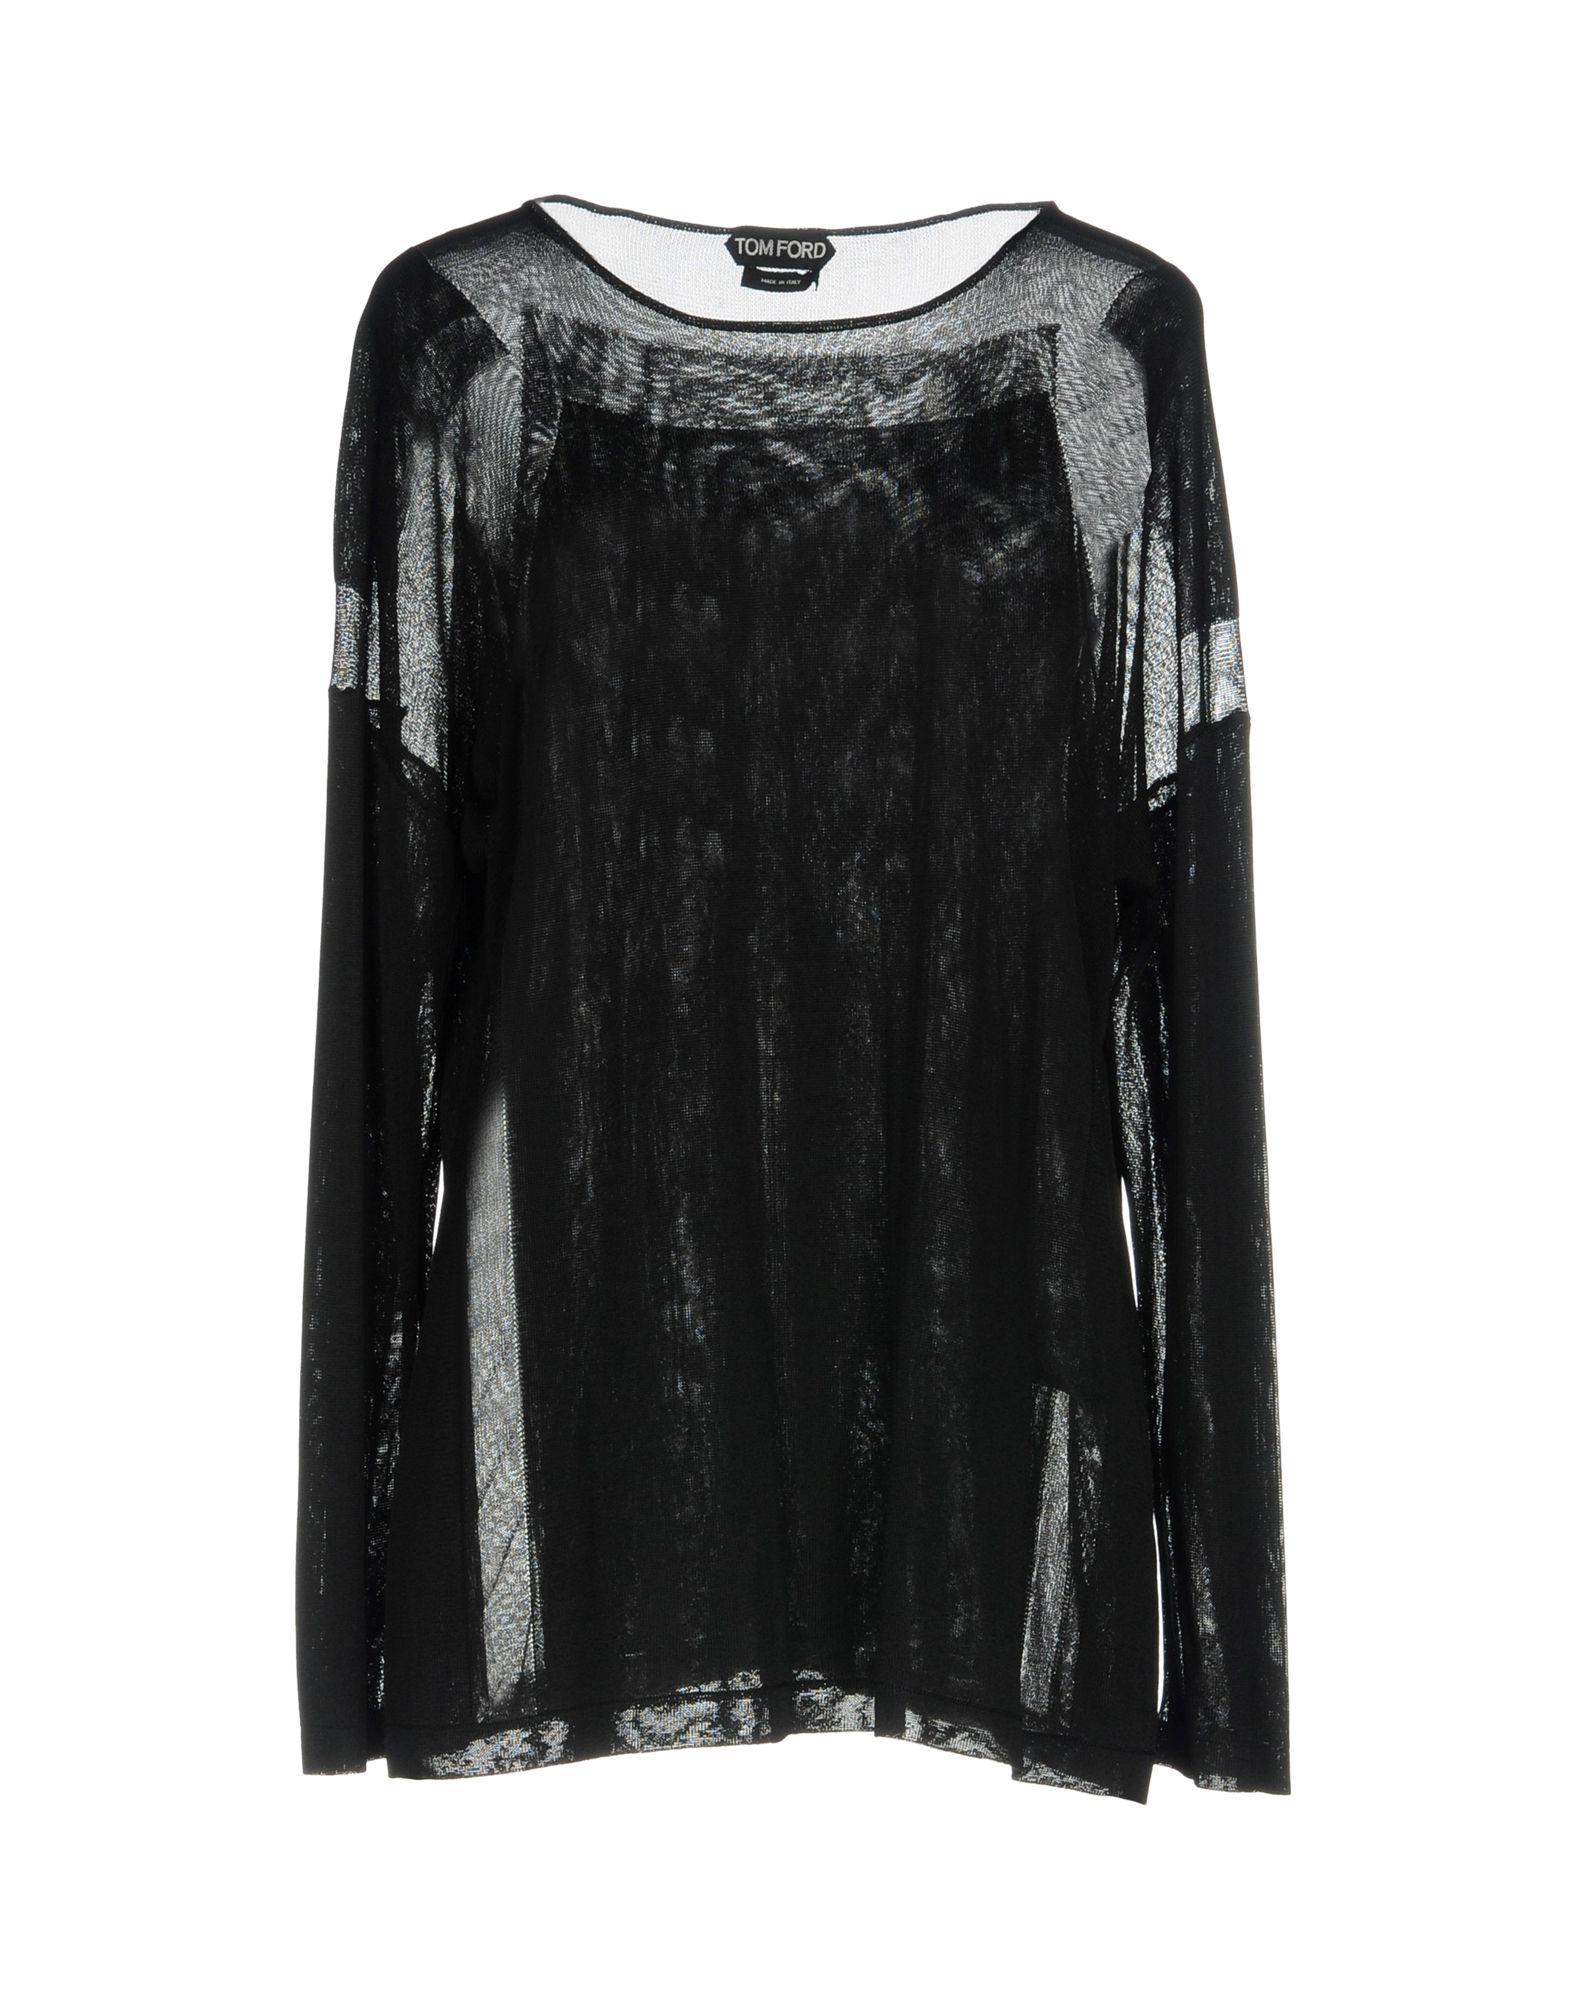 ФОТО tom ford свитер